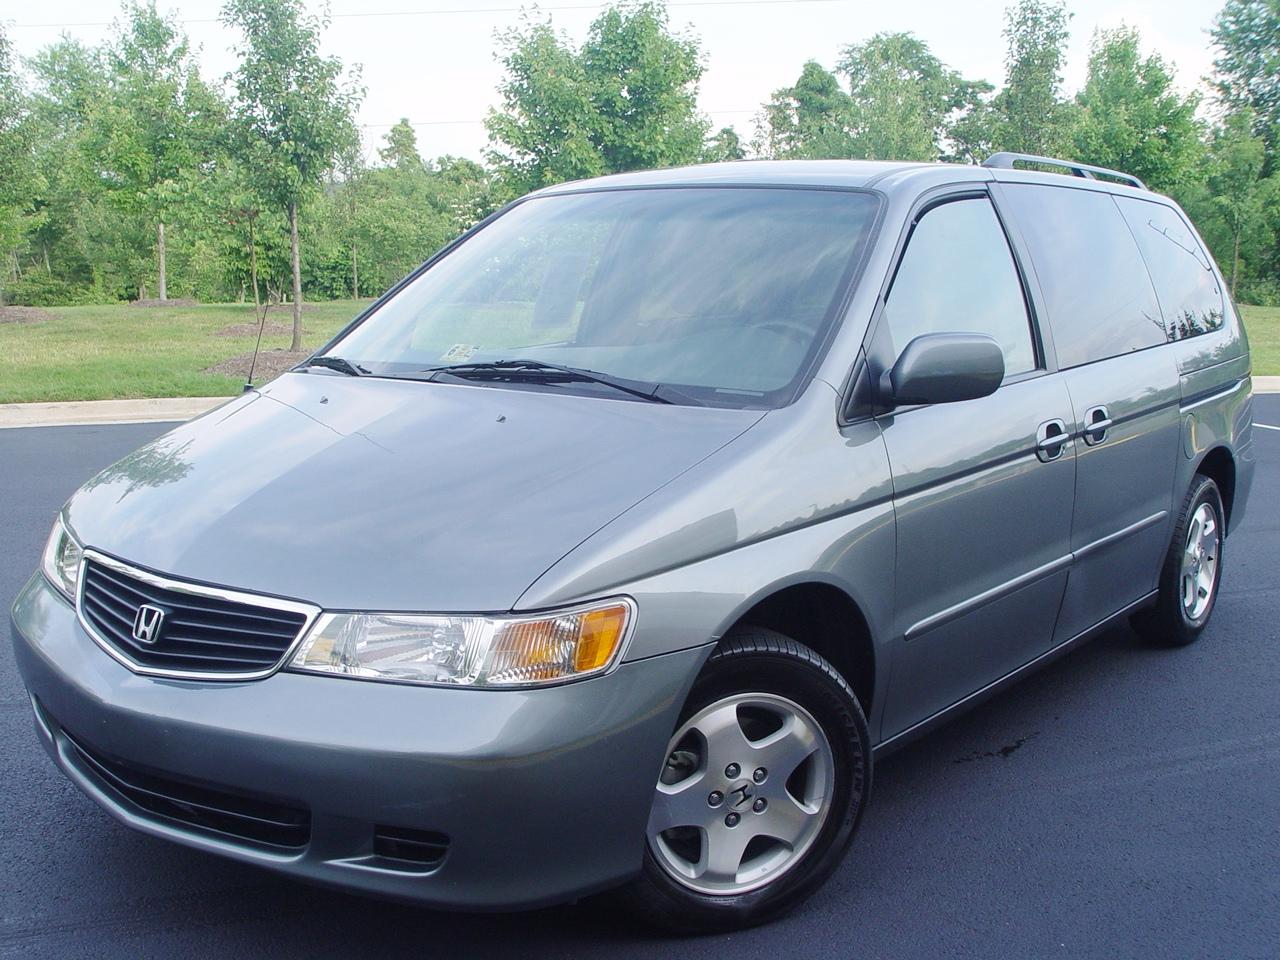 Picture of 2001 Honda Odyssey EX